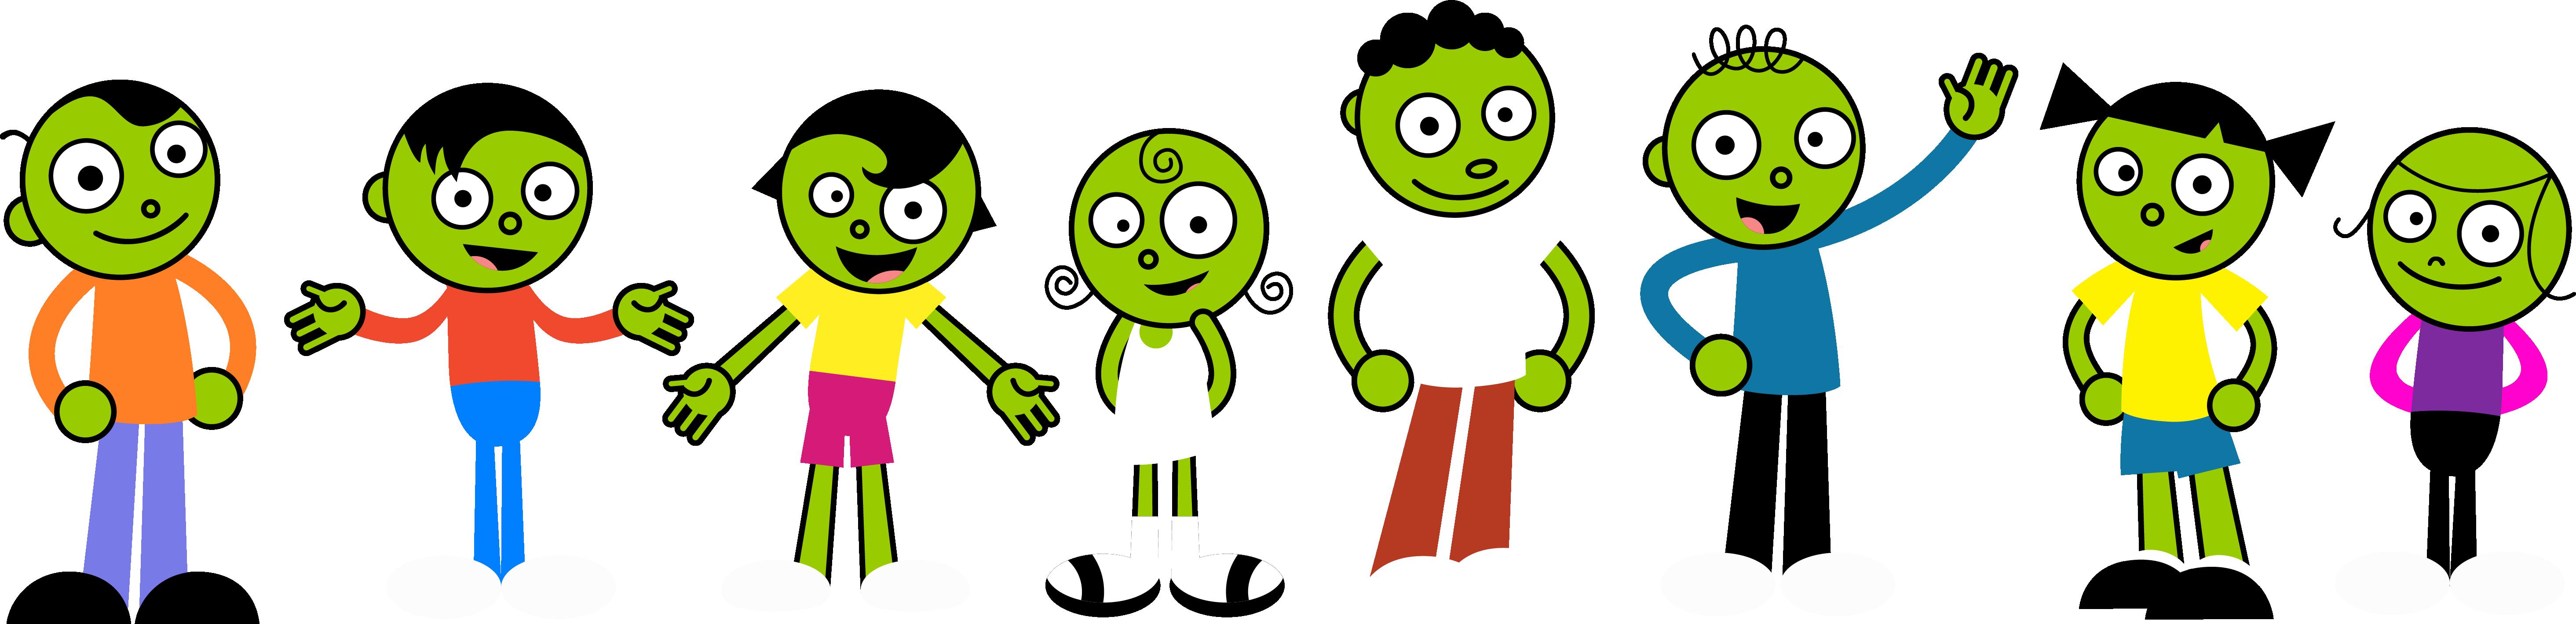 PBS Kids Digital Art - 1999 Characters by ...